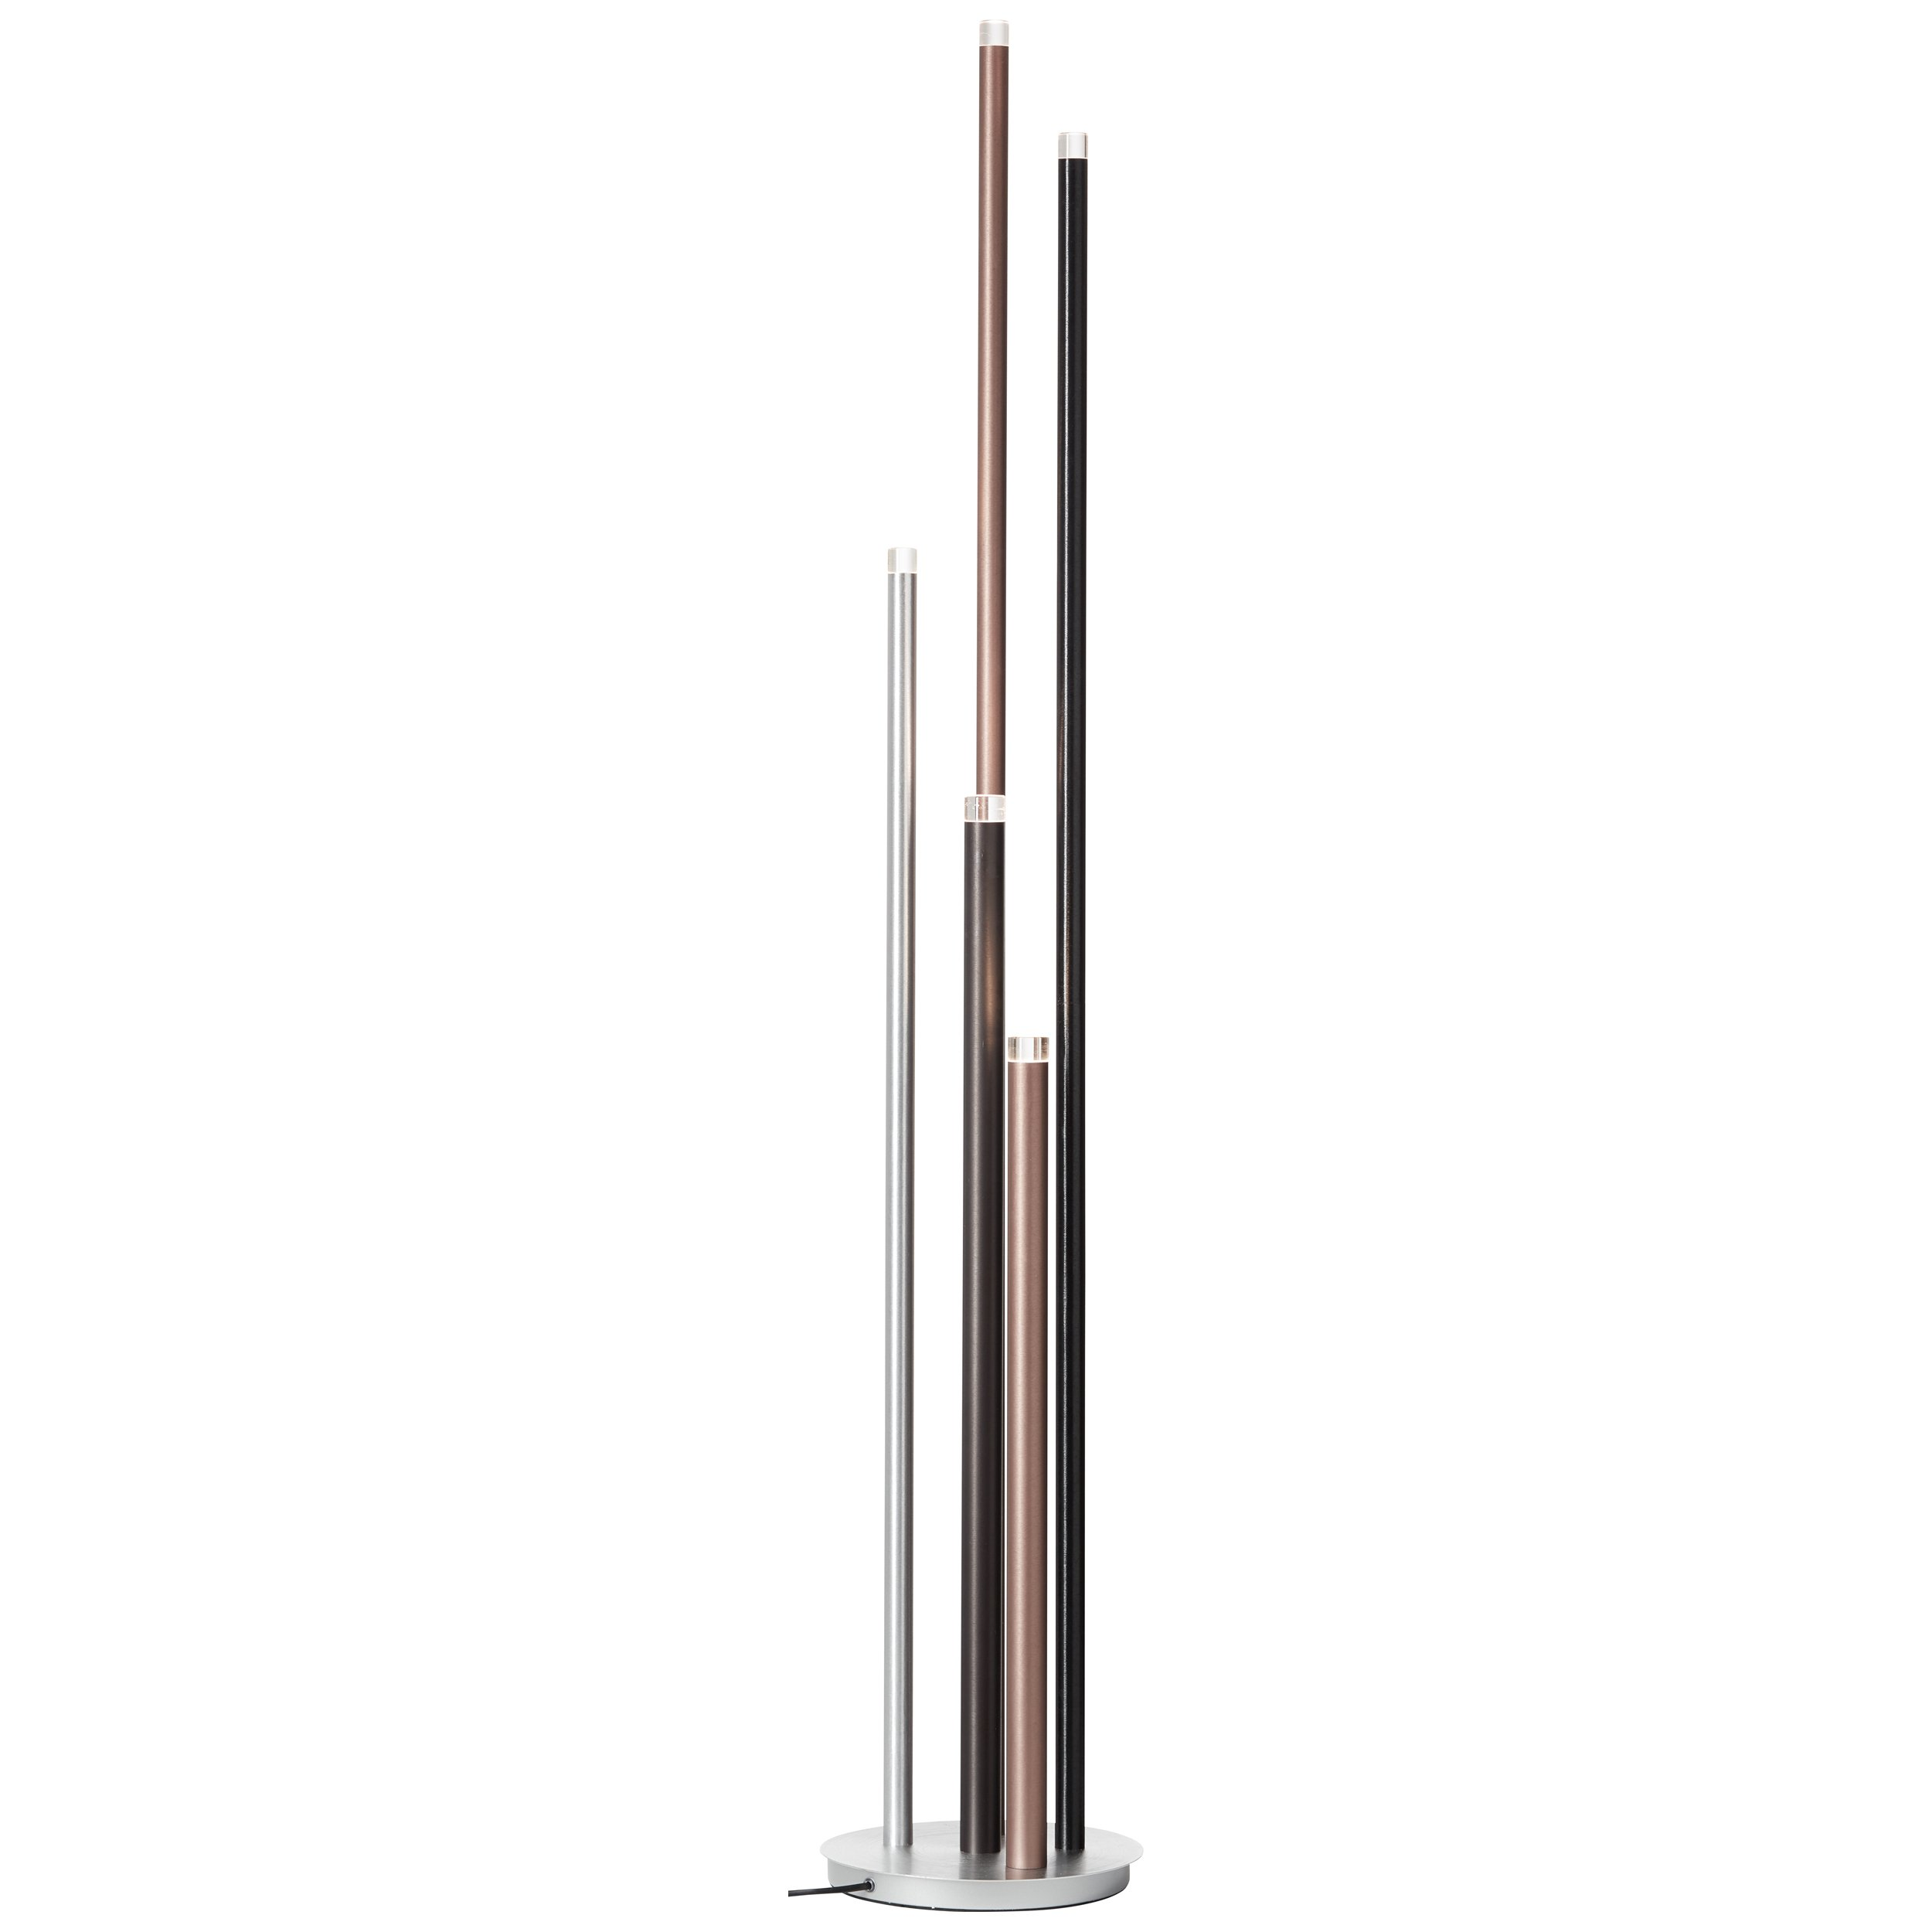 LED Standleuchte 5-flammig H155,30 D27,50, Braun